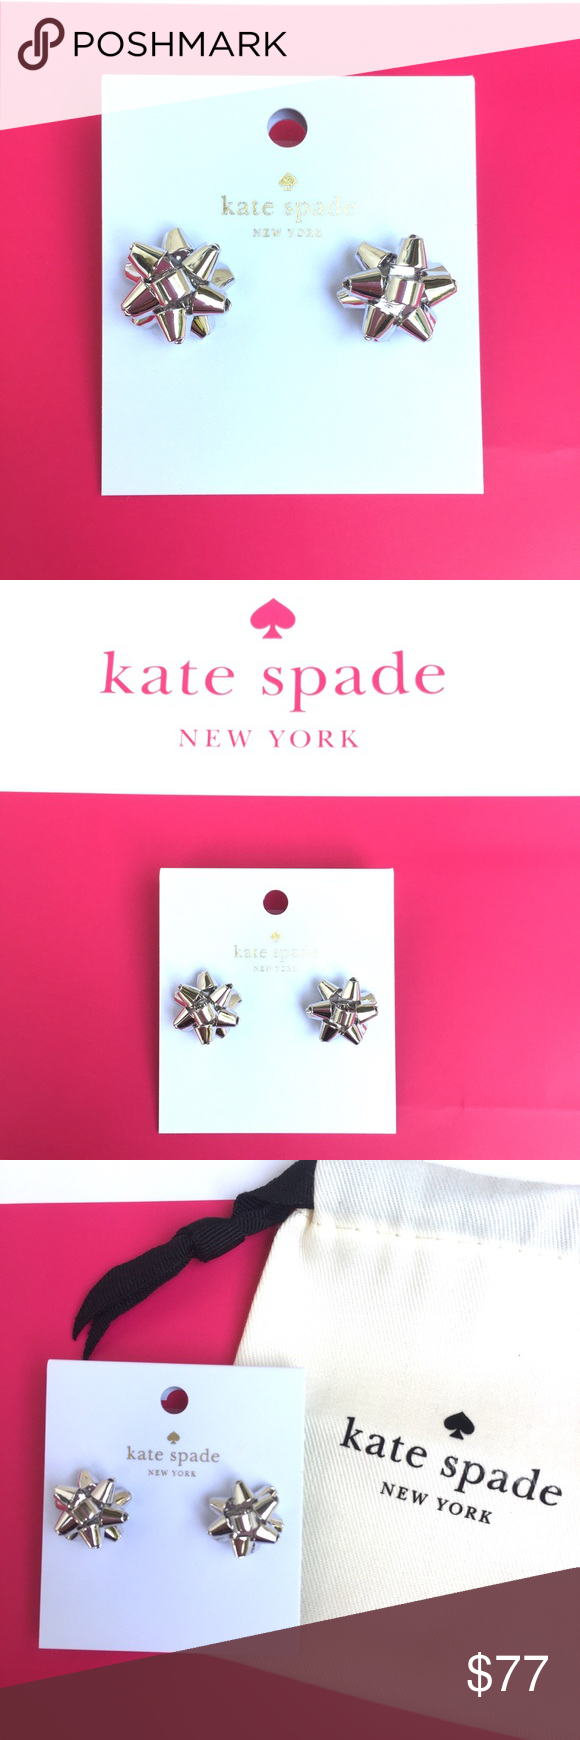 Kate Spade Bourgeois Bow Stud Earrings - Stud Earrings References